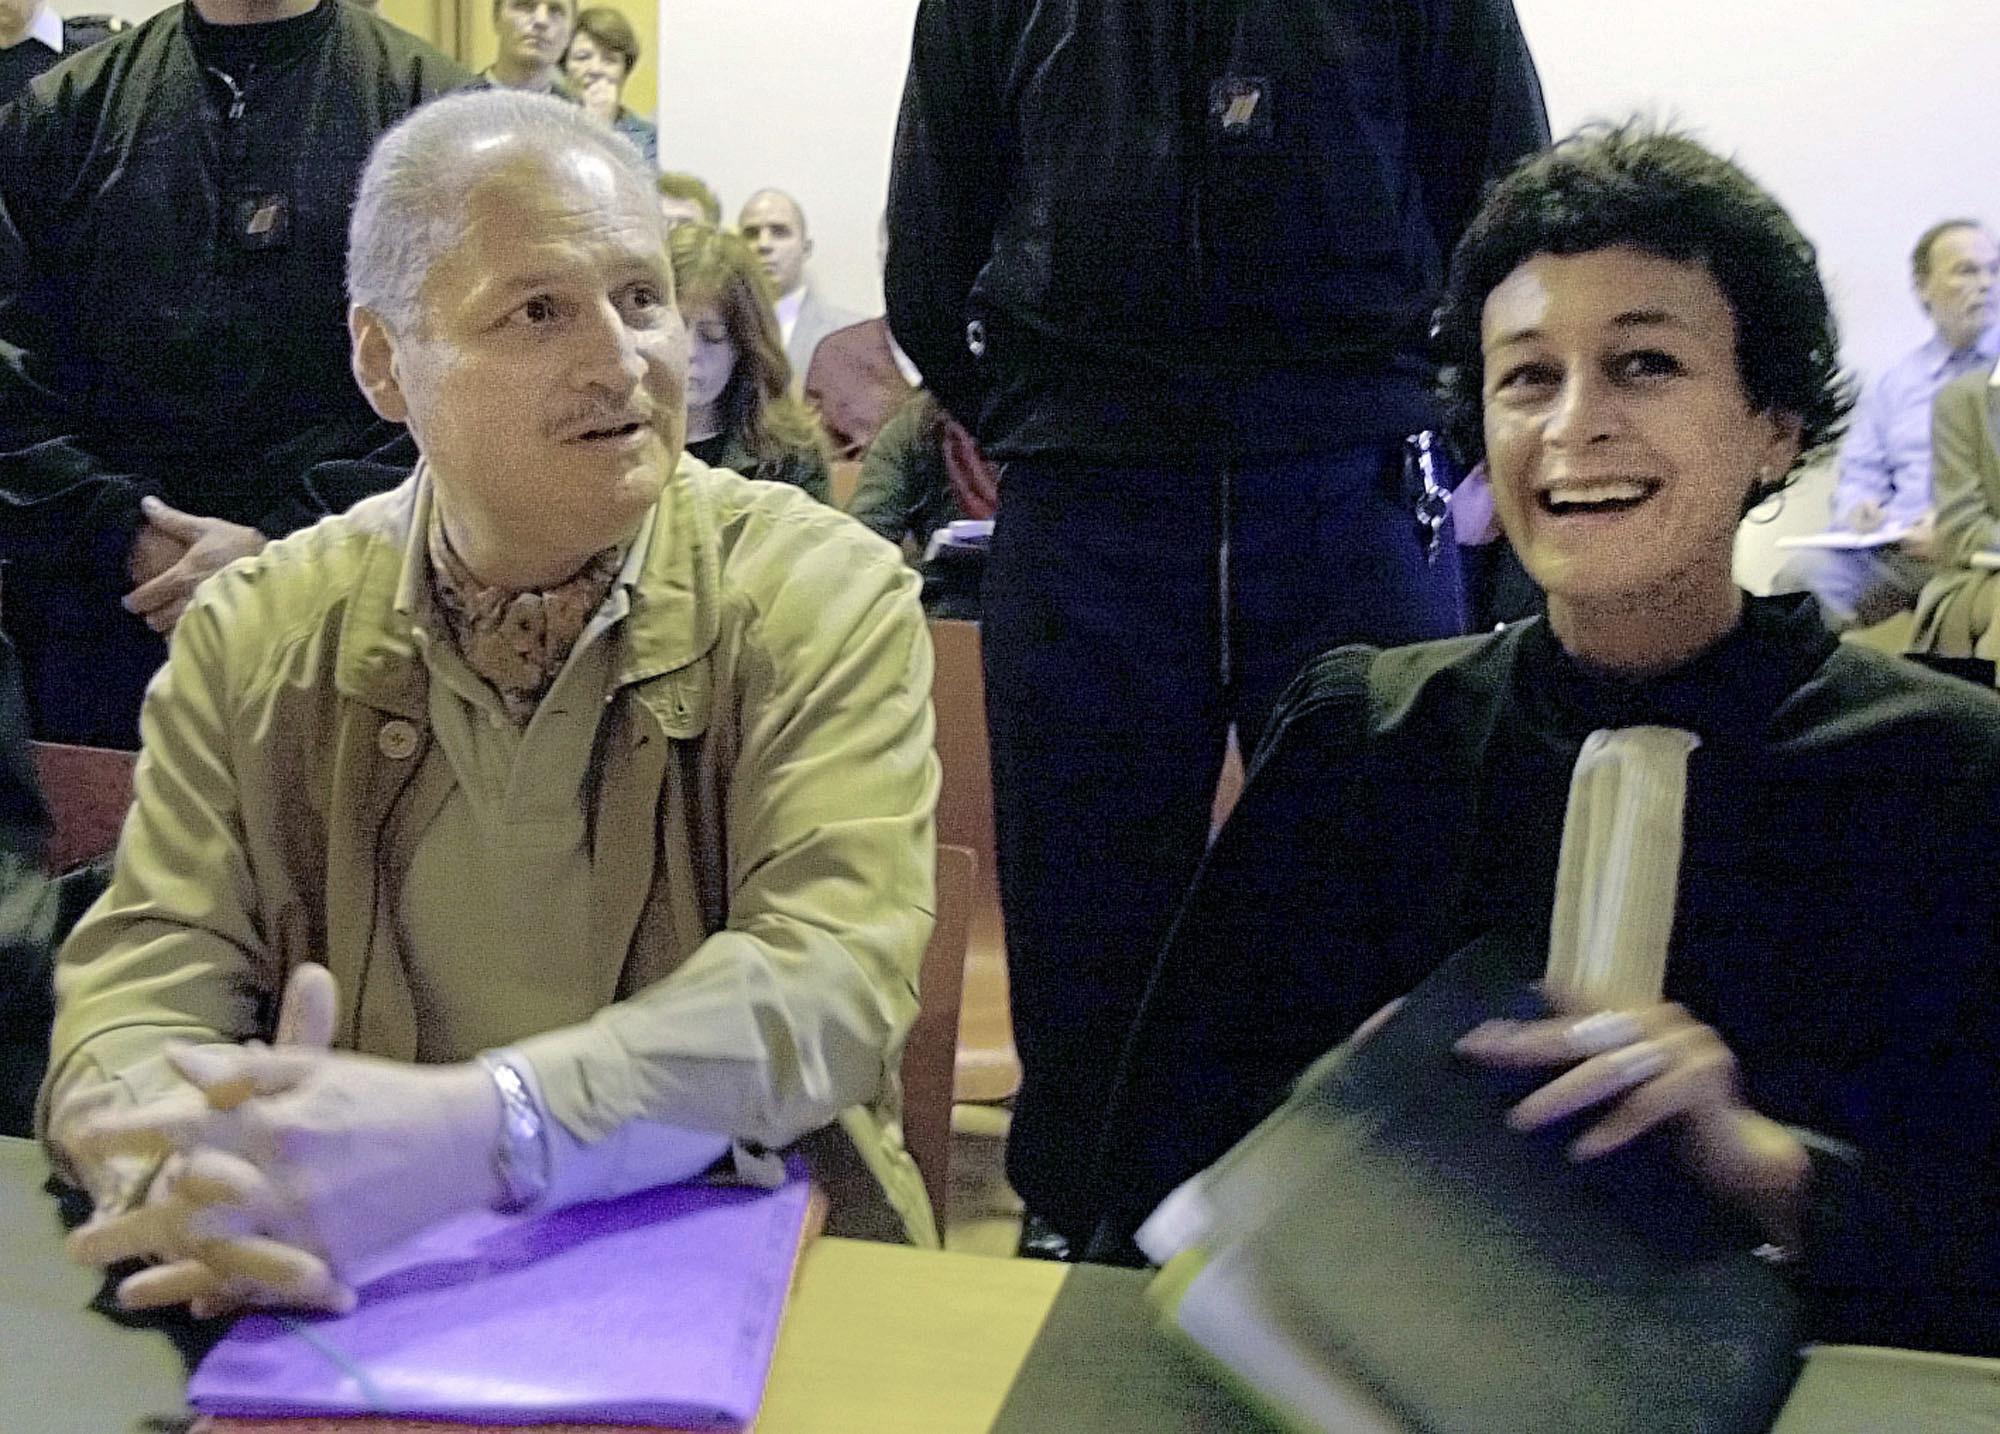 Venezuelan international terrorist Carlos the Jackal whose real name is Ilich Ramirez Sanchez (L) sits with his French lawyer Isabelle Coutant-Peyre in a Paris courtroom on Nov. 28, 2000. (AP Photo/Michel Lipchitz)